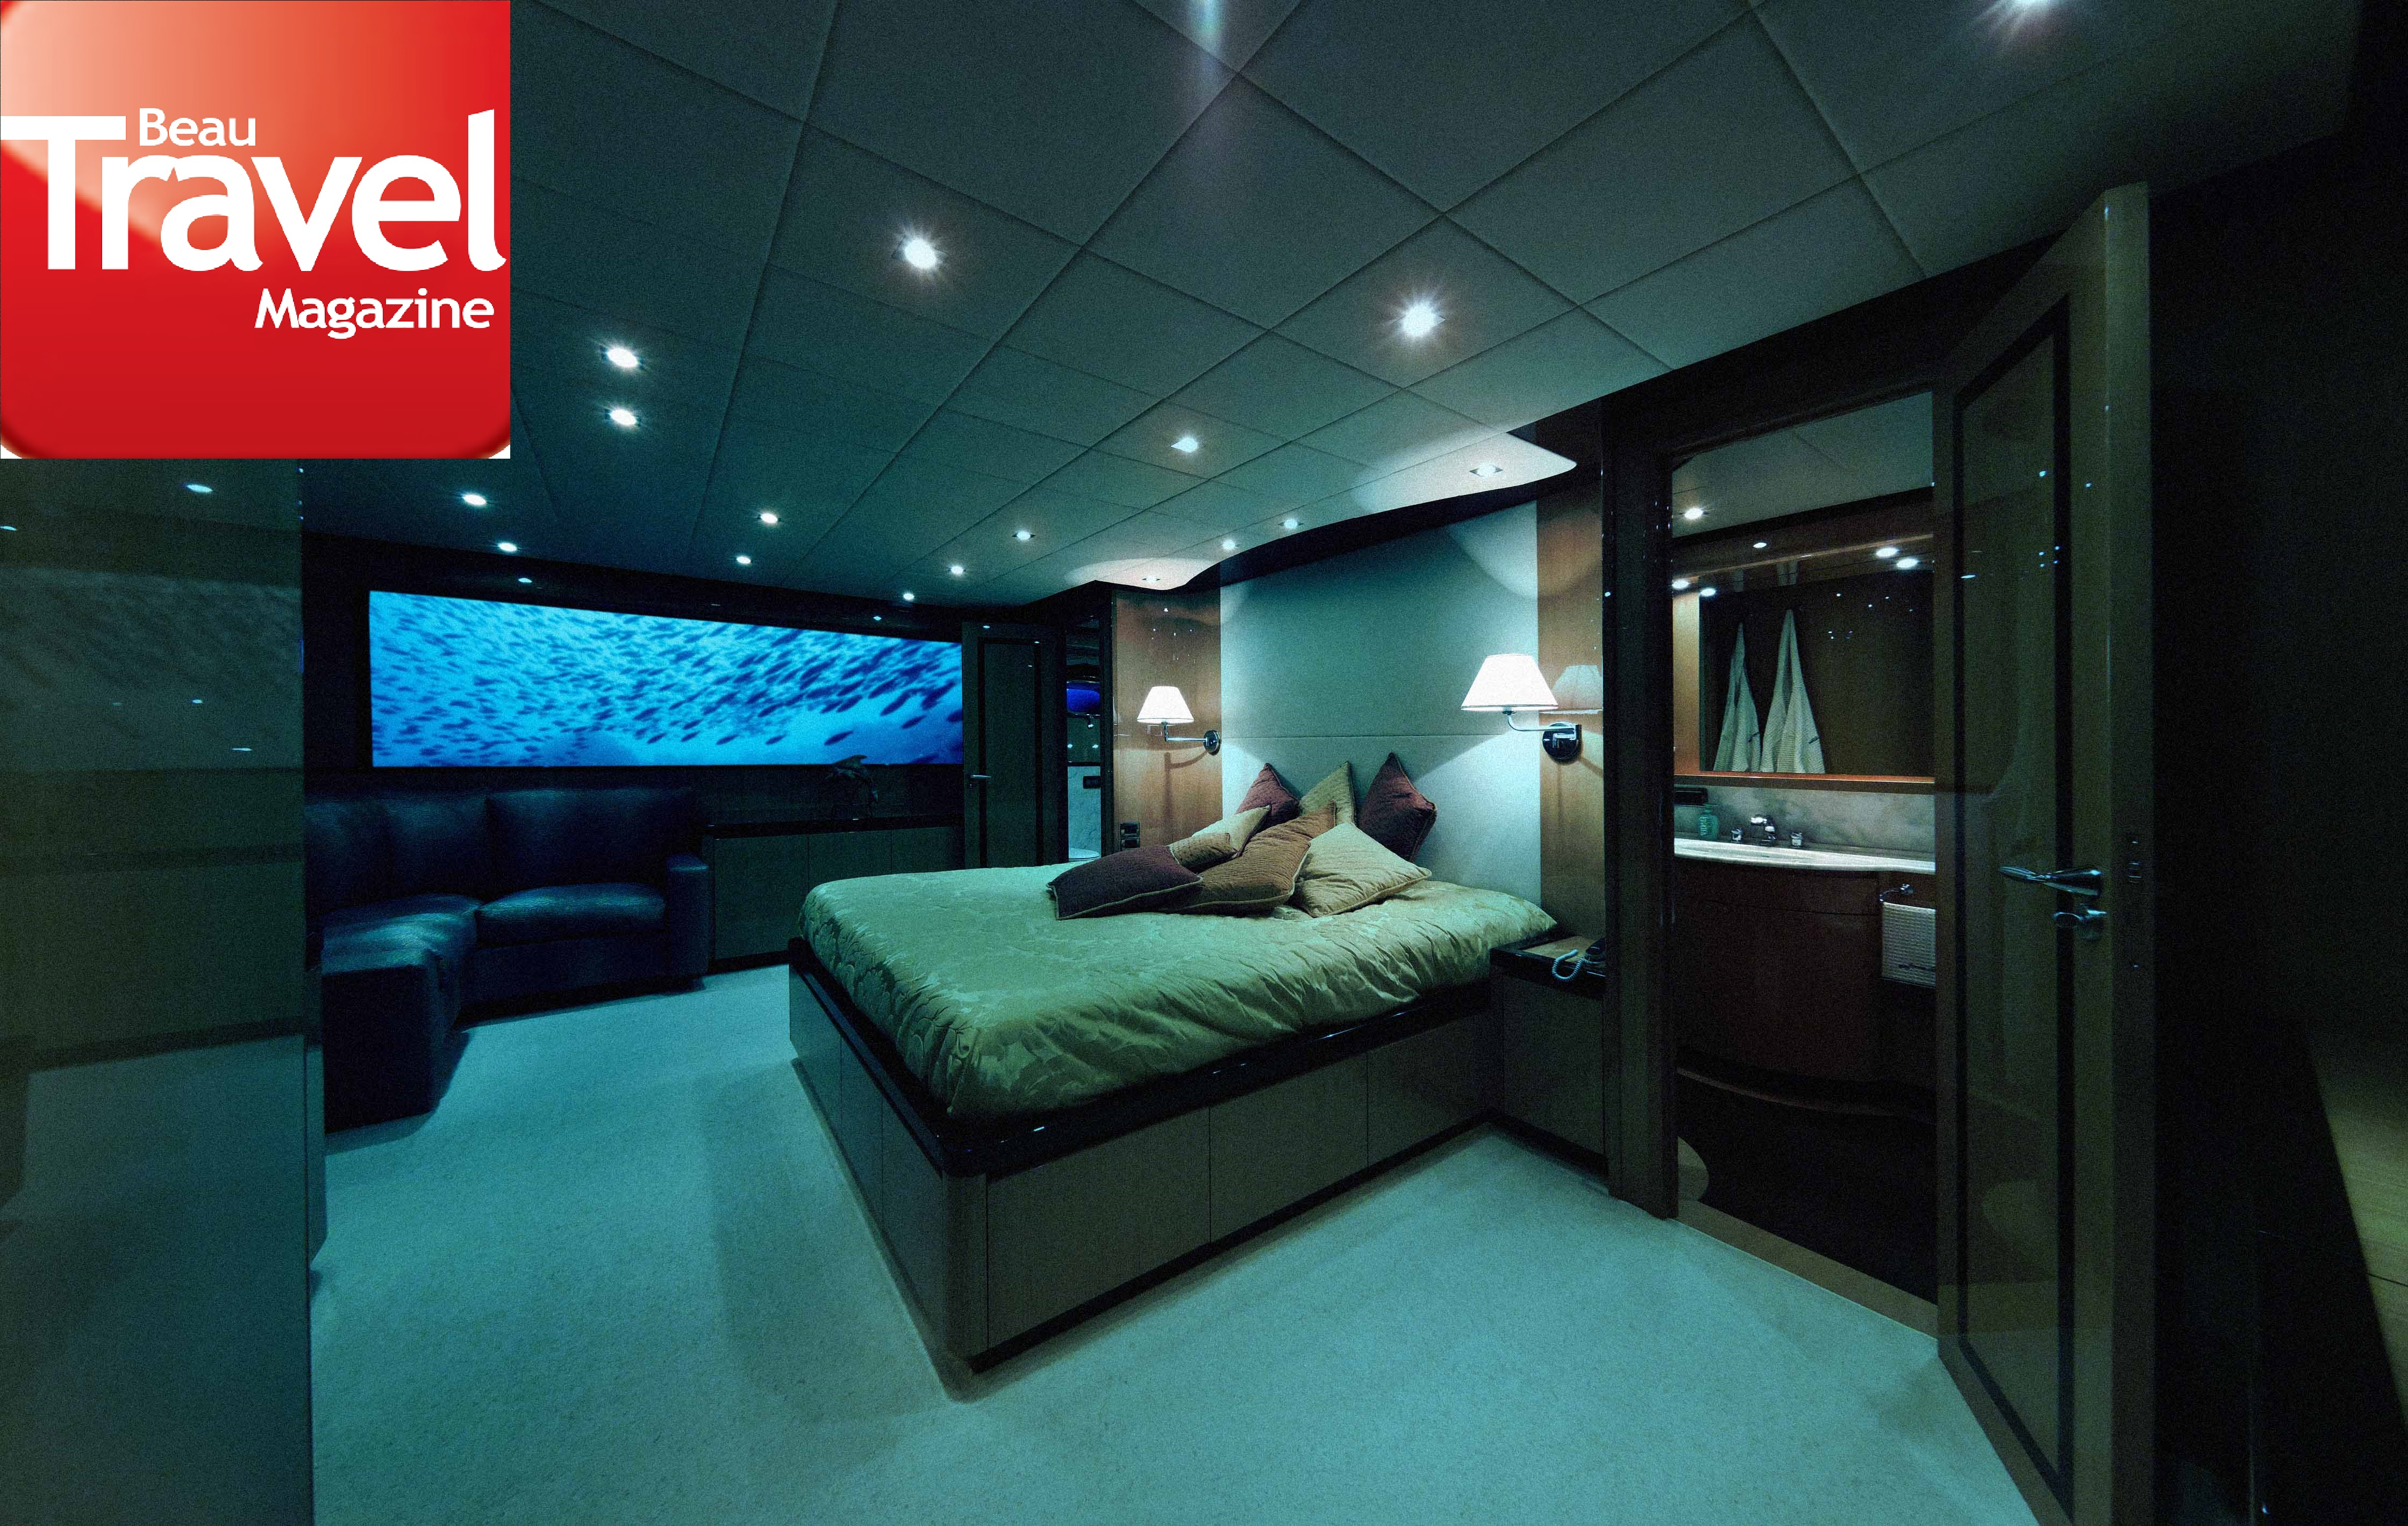 Beau Magazine - Oliver's Travels Lucury Villas to Rent